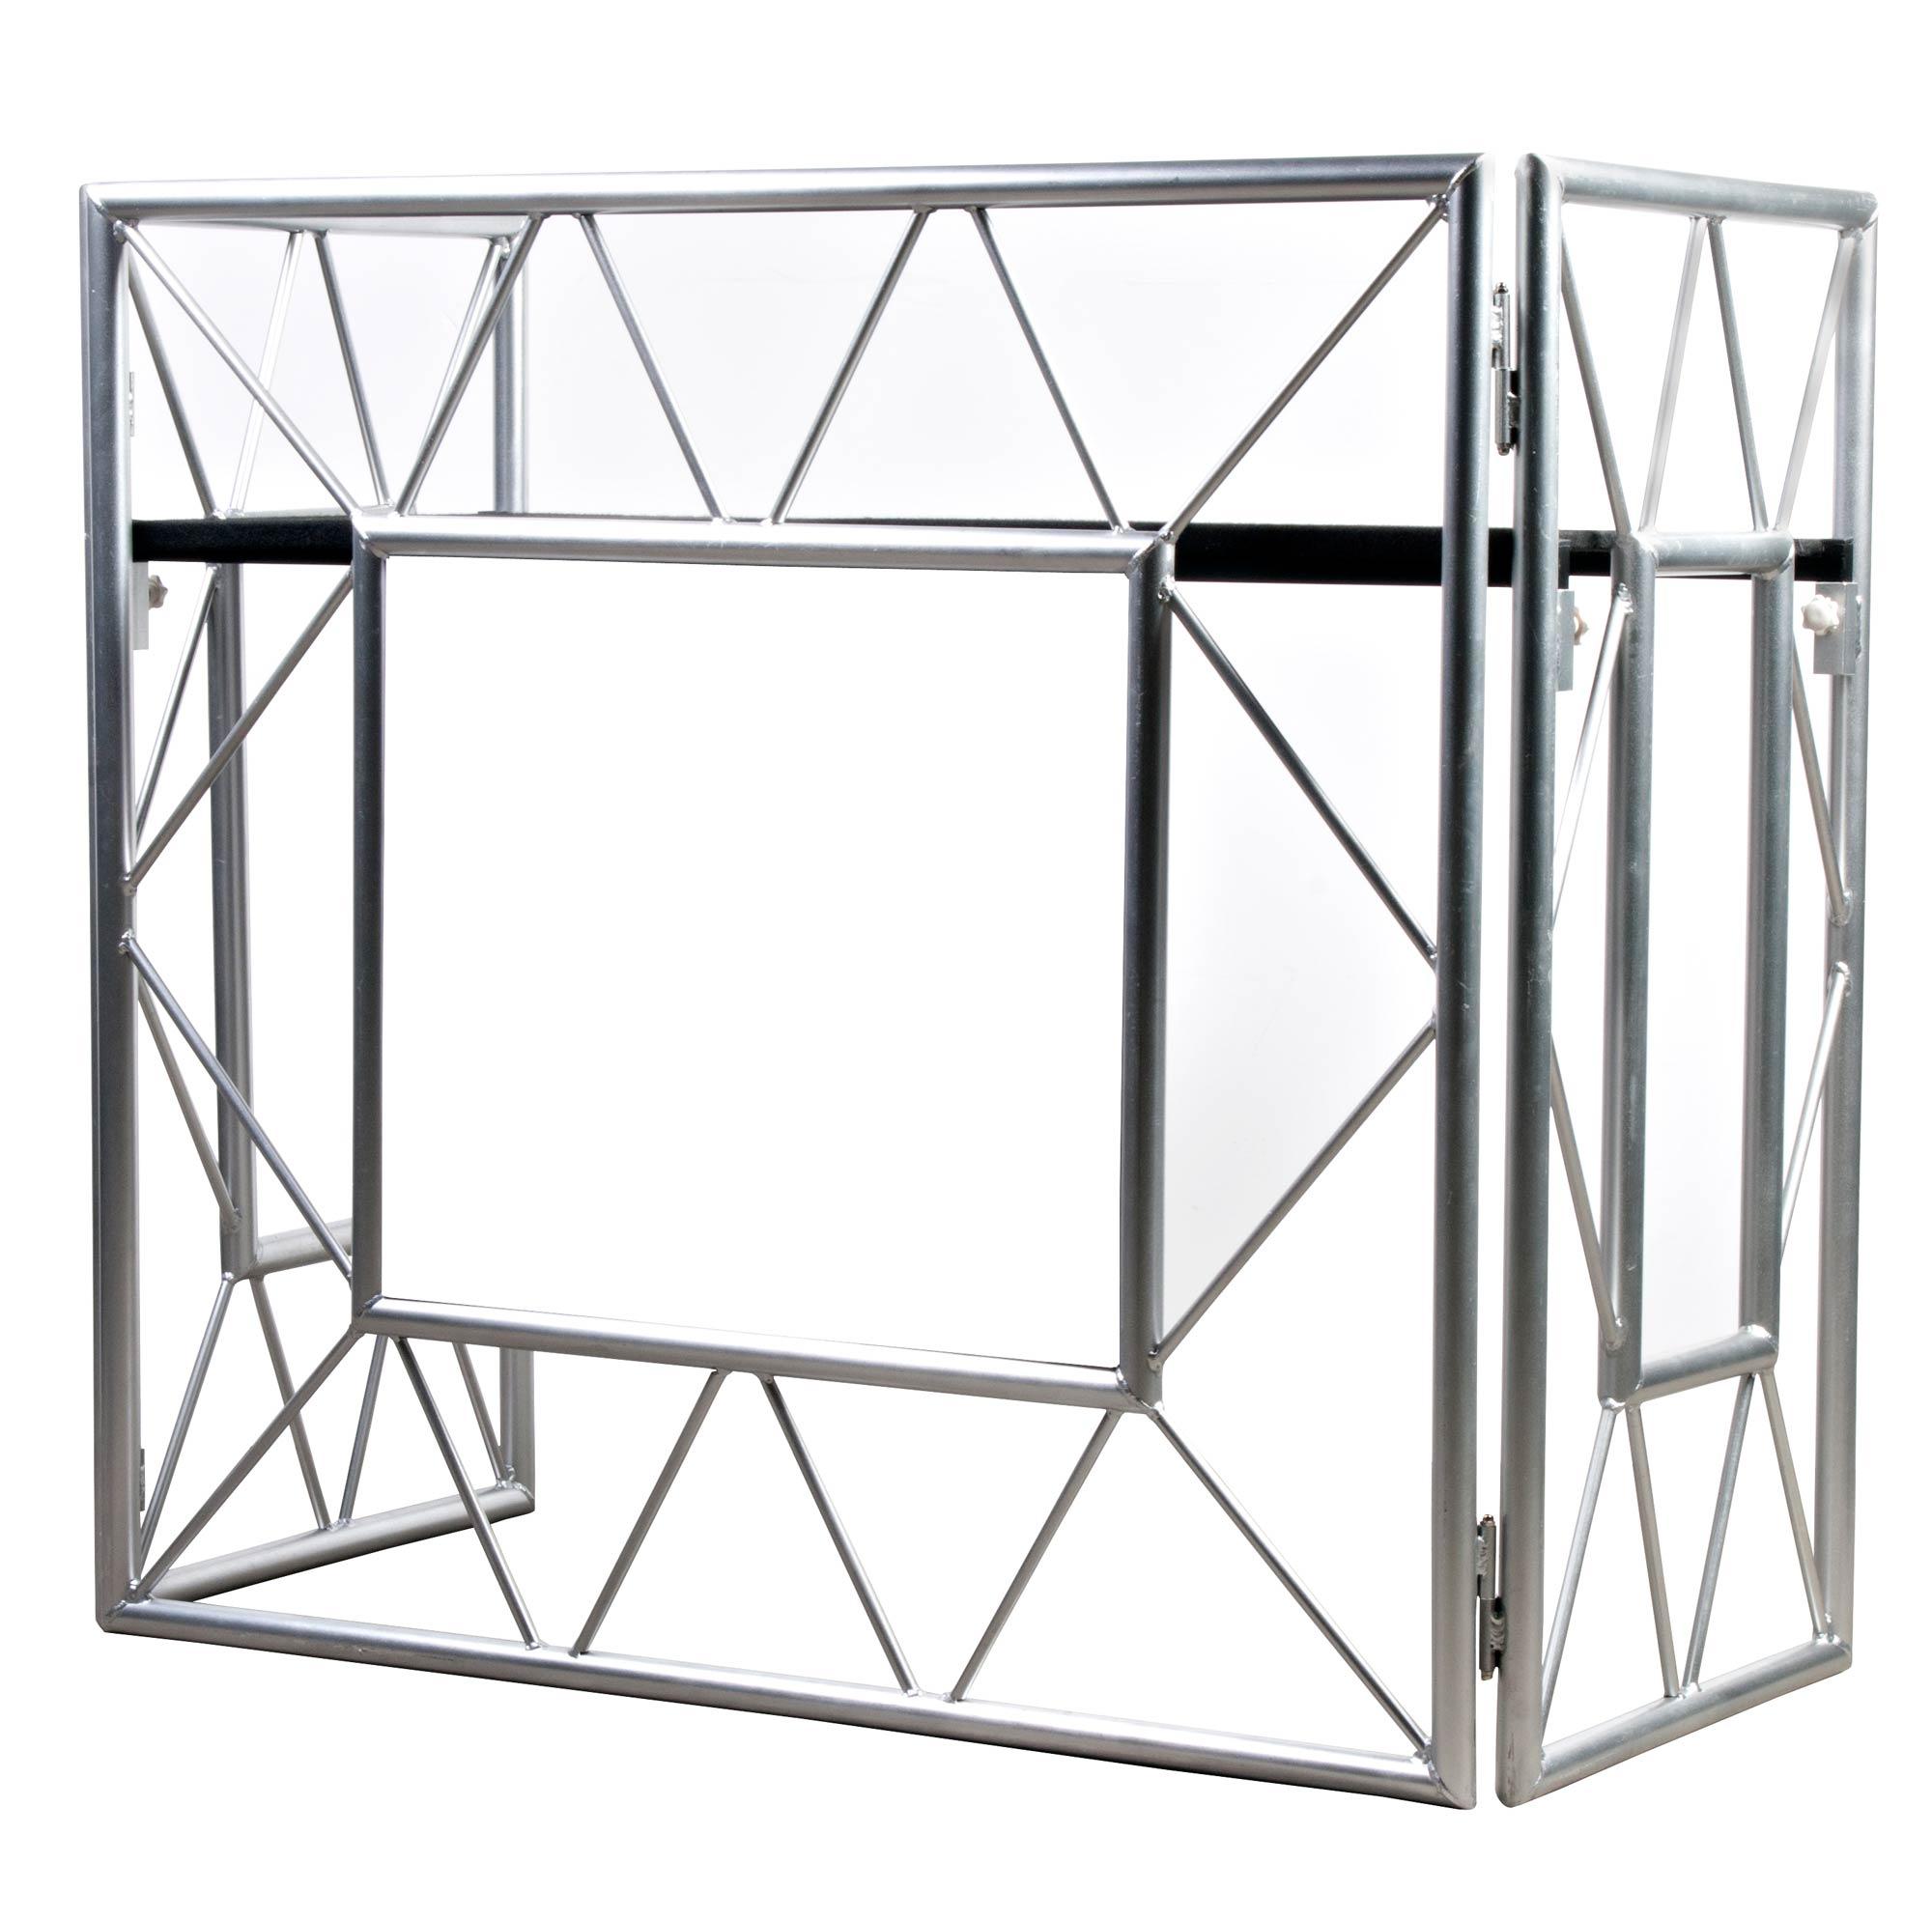 American Audio Adj Pro Event Table Ii Aluminum Folding Dj